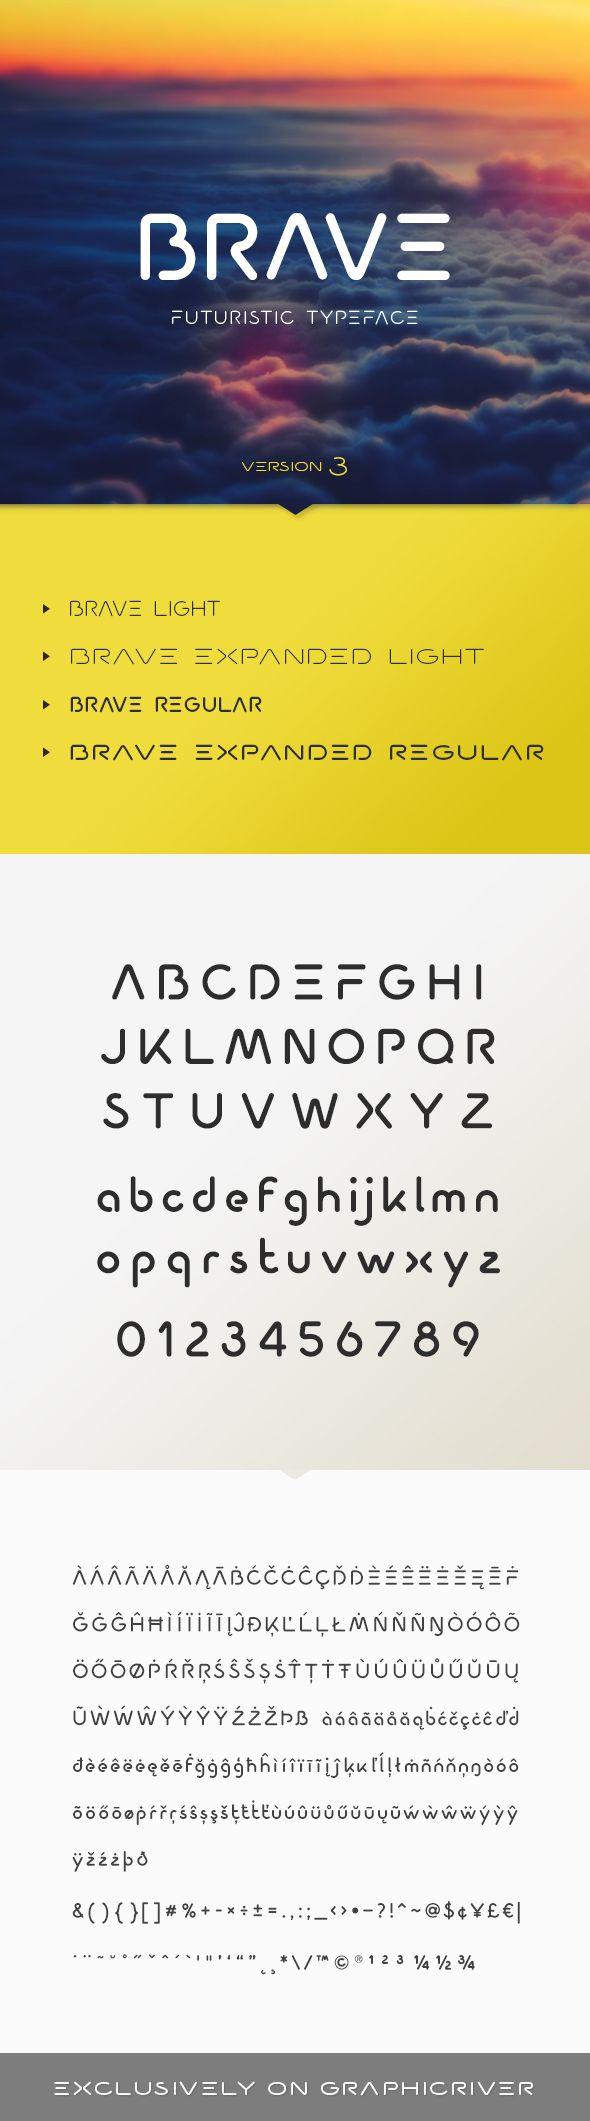 Brave Typeface - Futuristic Decorative | Download font : https://graphicriver.net/item/brave-typeface/12058868?ref=sinzo #font